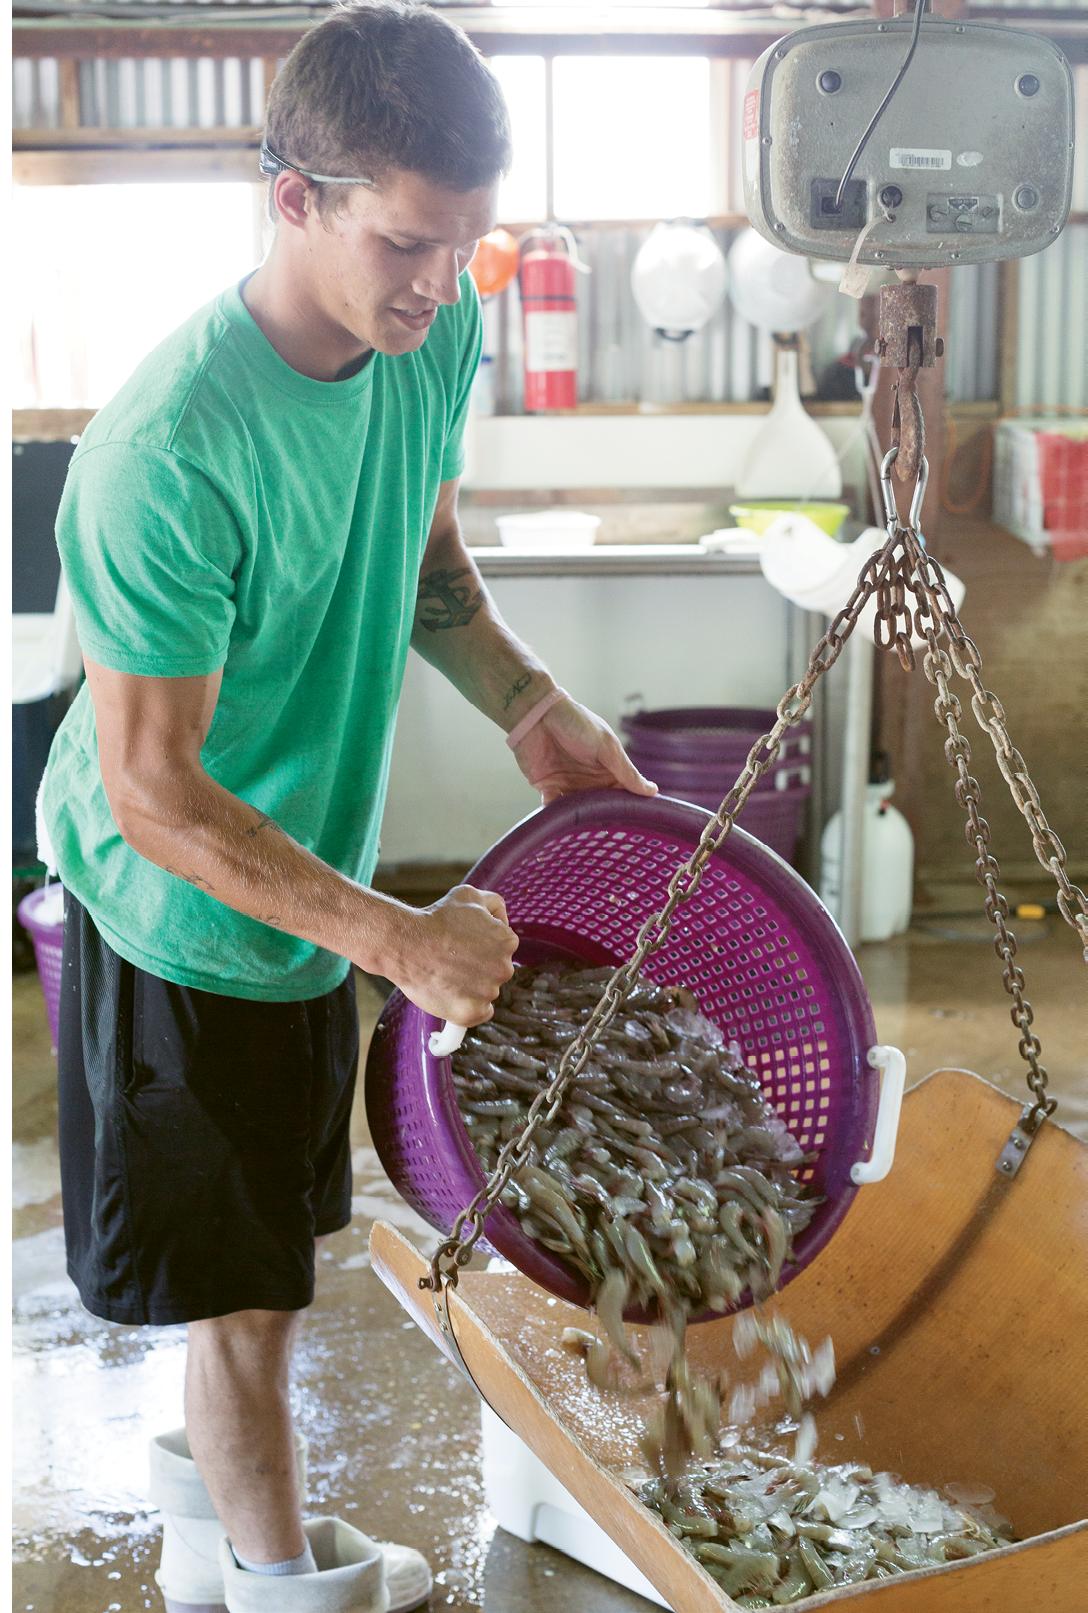 Kola Tarvin weighs headed shrimp.